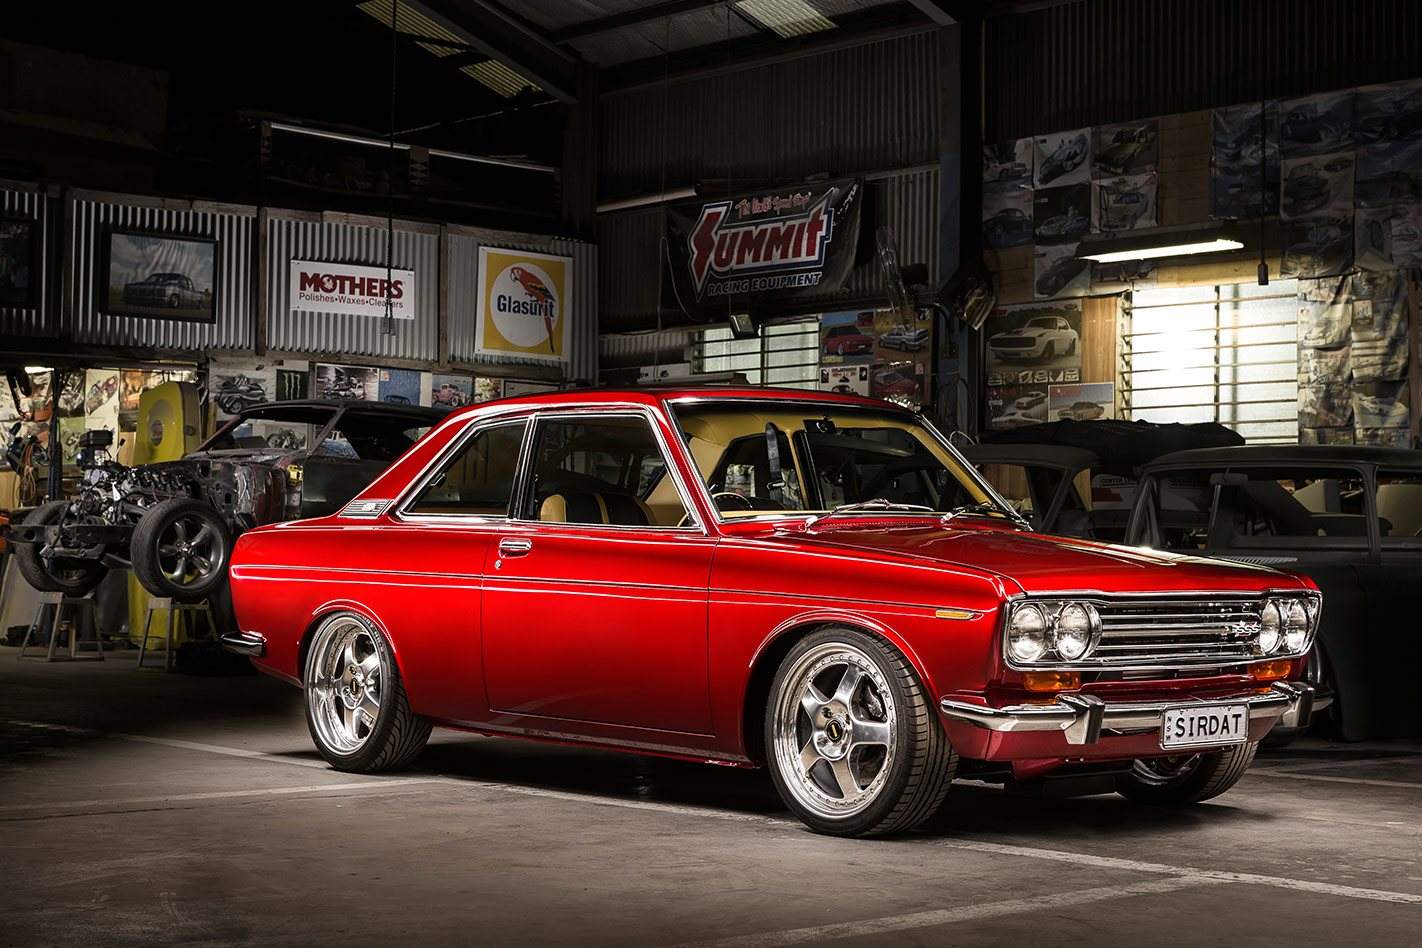 Mazda 3 2017 Custom >> ELITE-LEVEL TURBO 1969 DATSUN 1600 SSS COUPE - SIRDAT